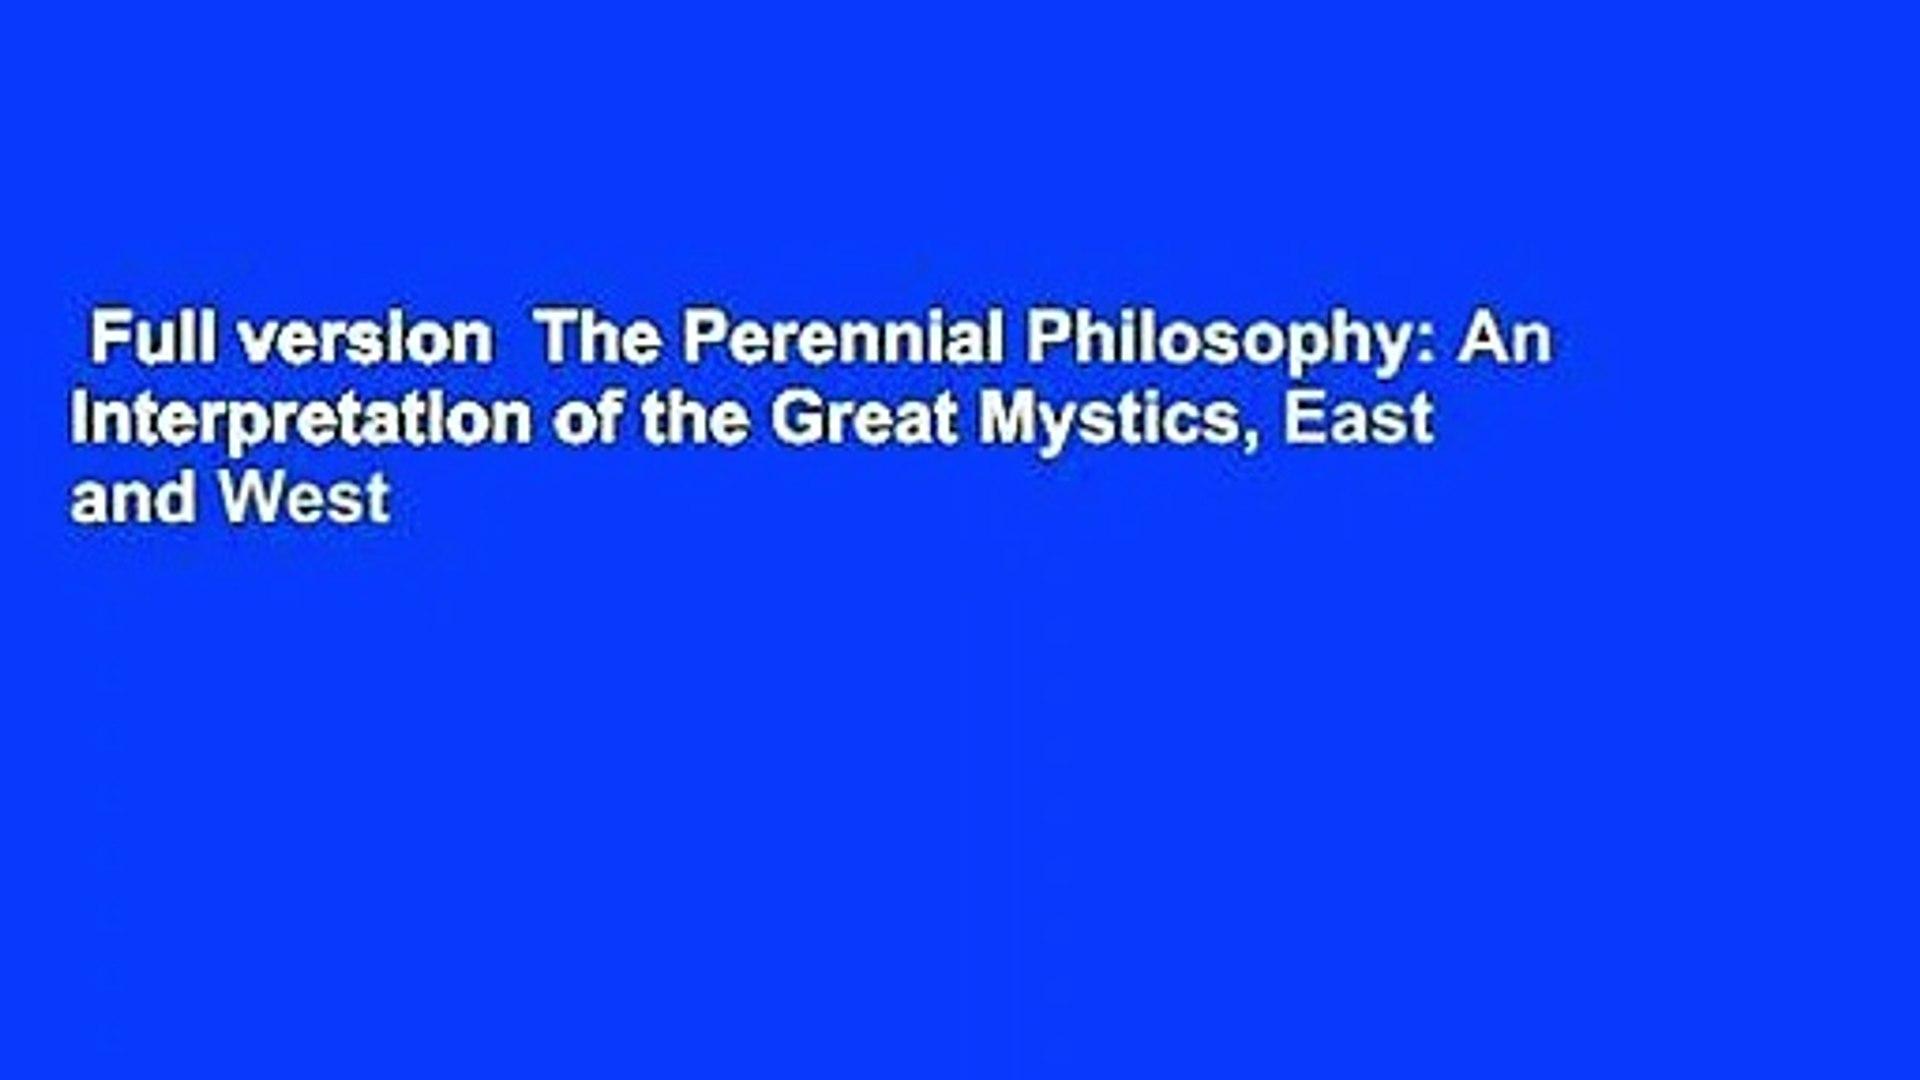 Bestseller: The Perennial Philosophy Aldous Huxley Pdf